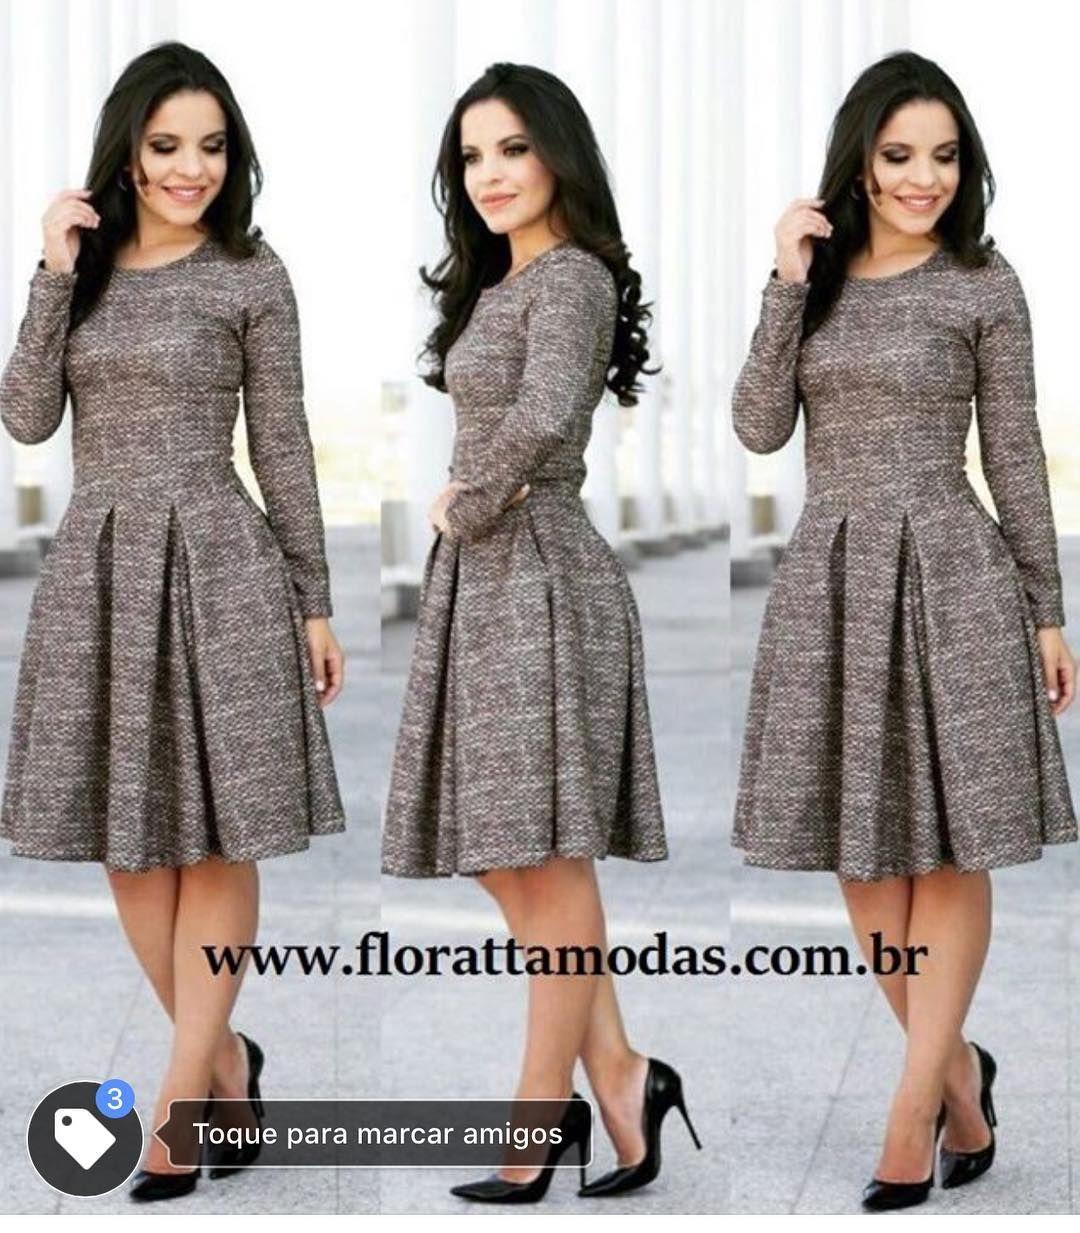 Dresses Floratta Dresses Evase Fashion Modas Outfits Fashion OH84q7wR